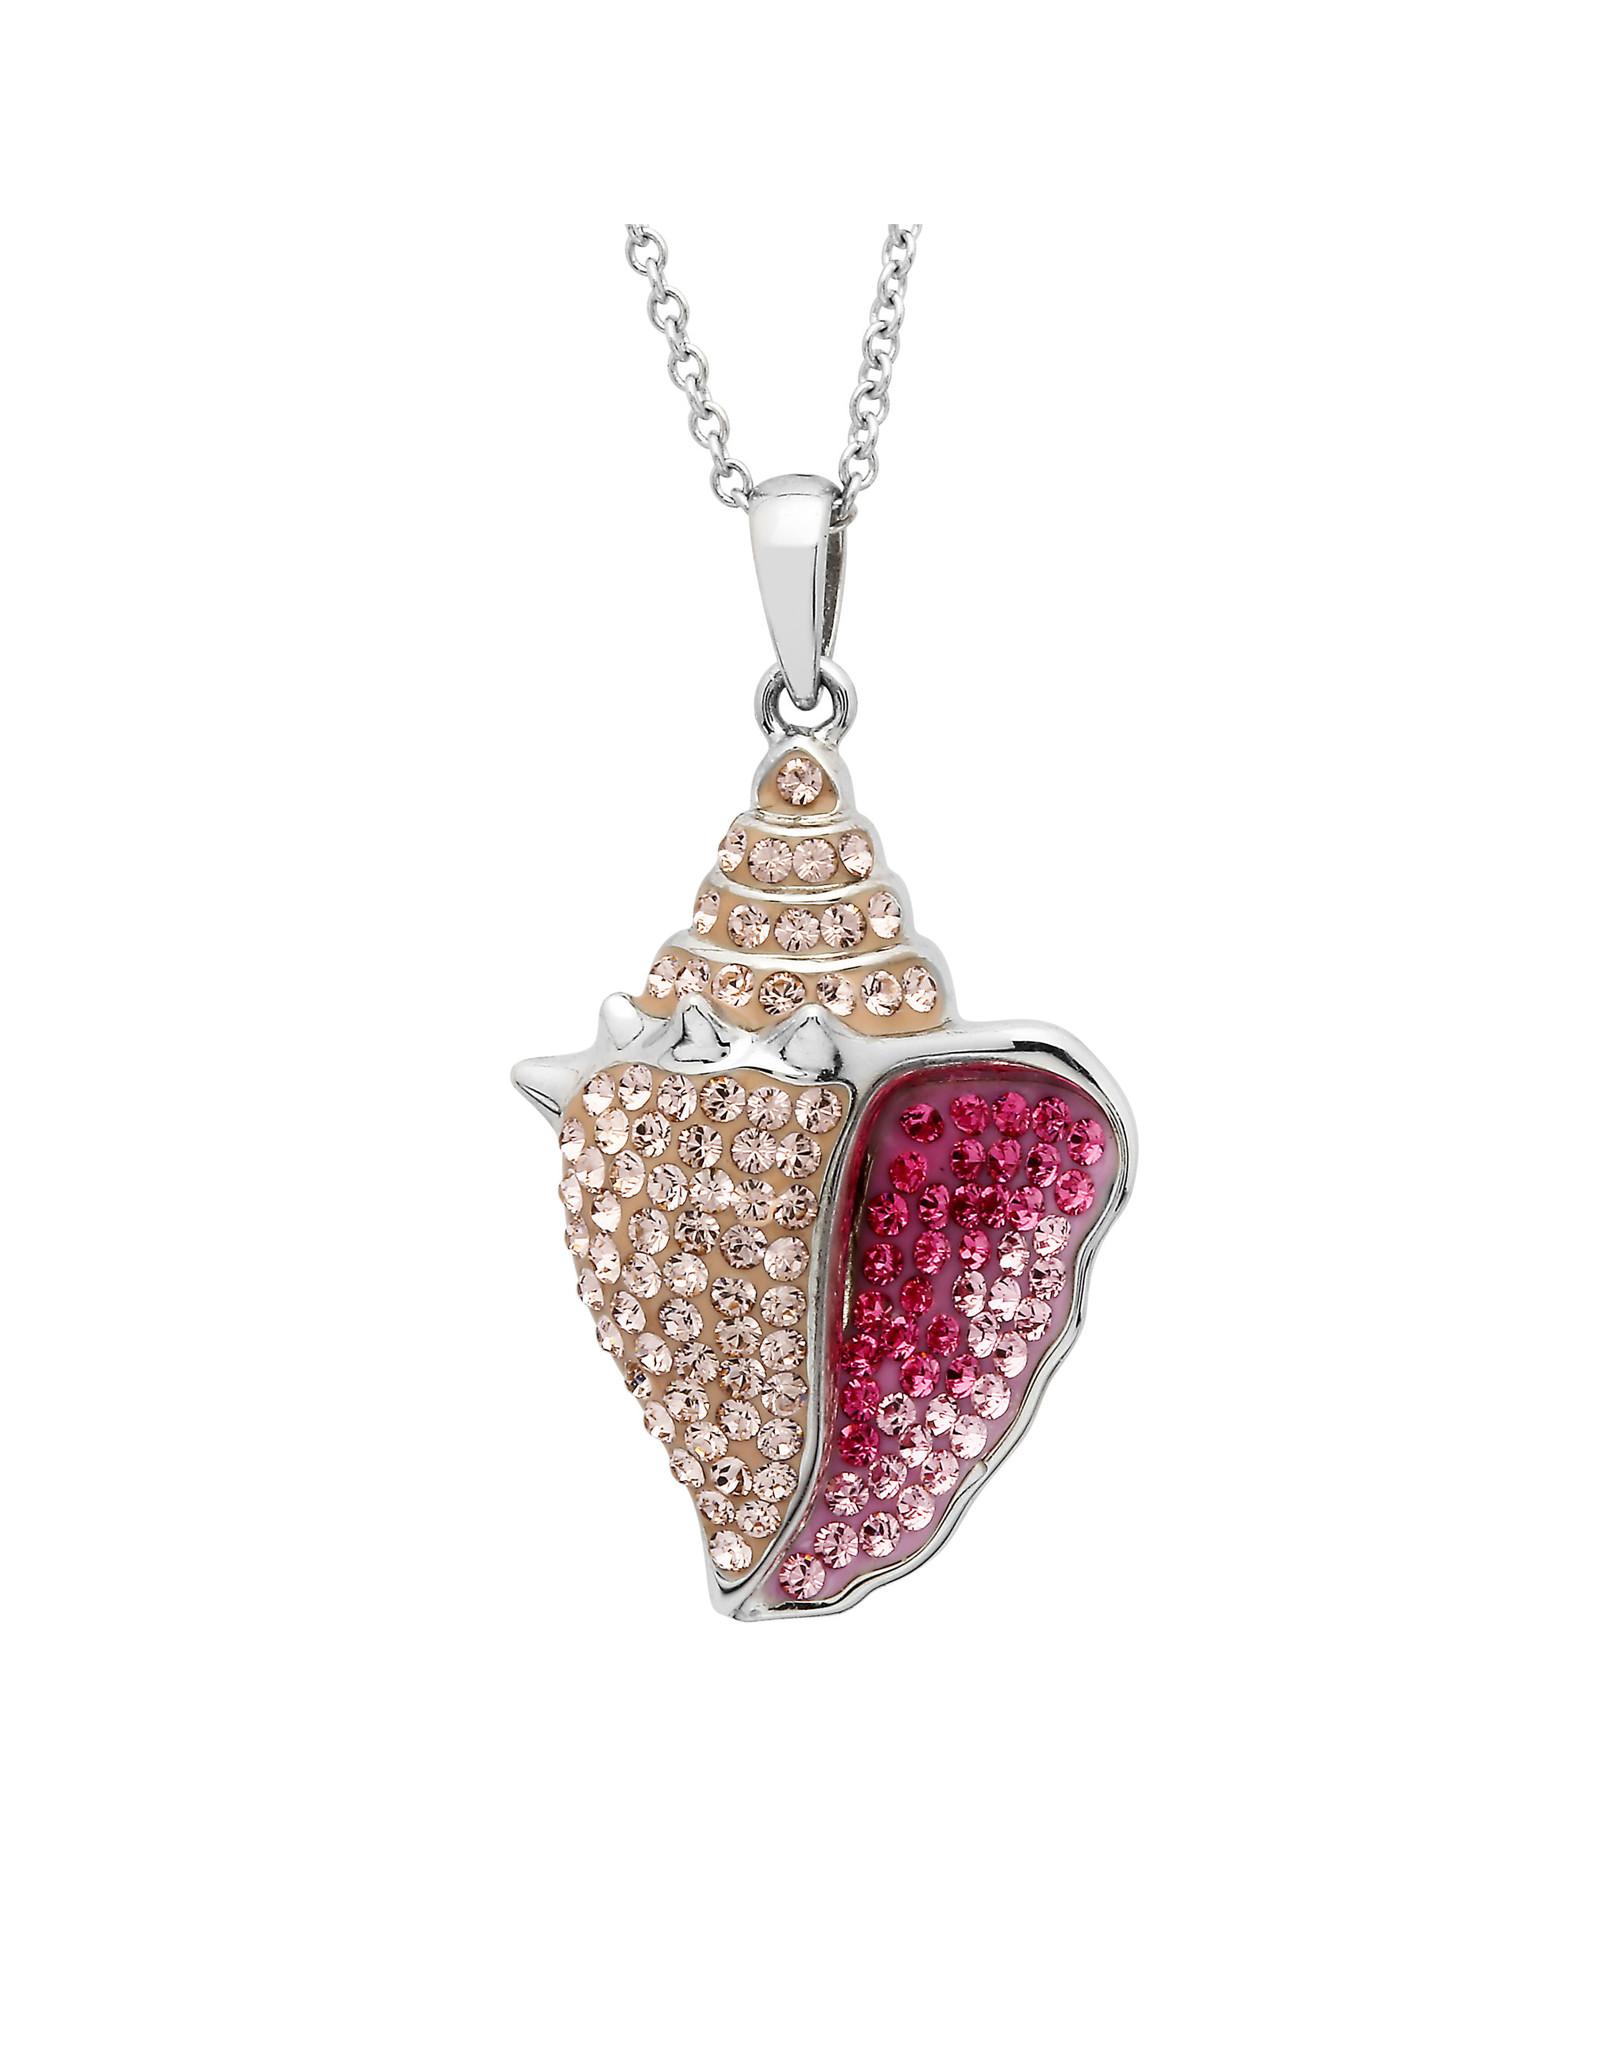 Ocean Jewelry Swarovski Conch Pendant